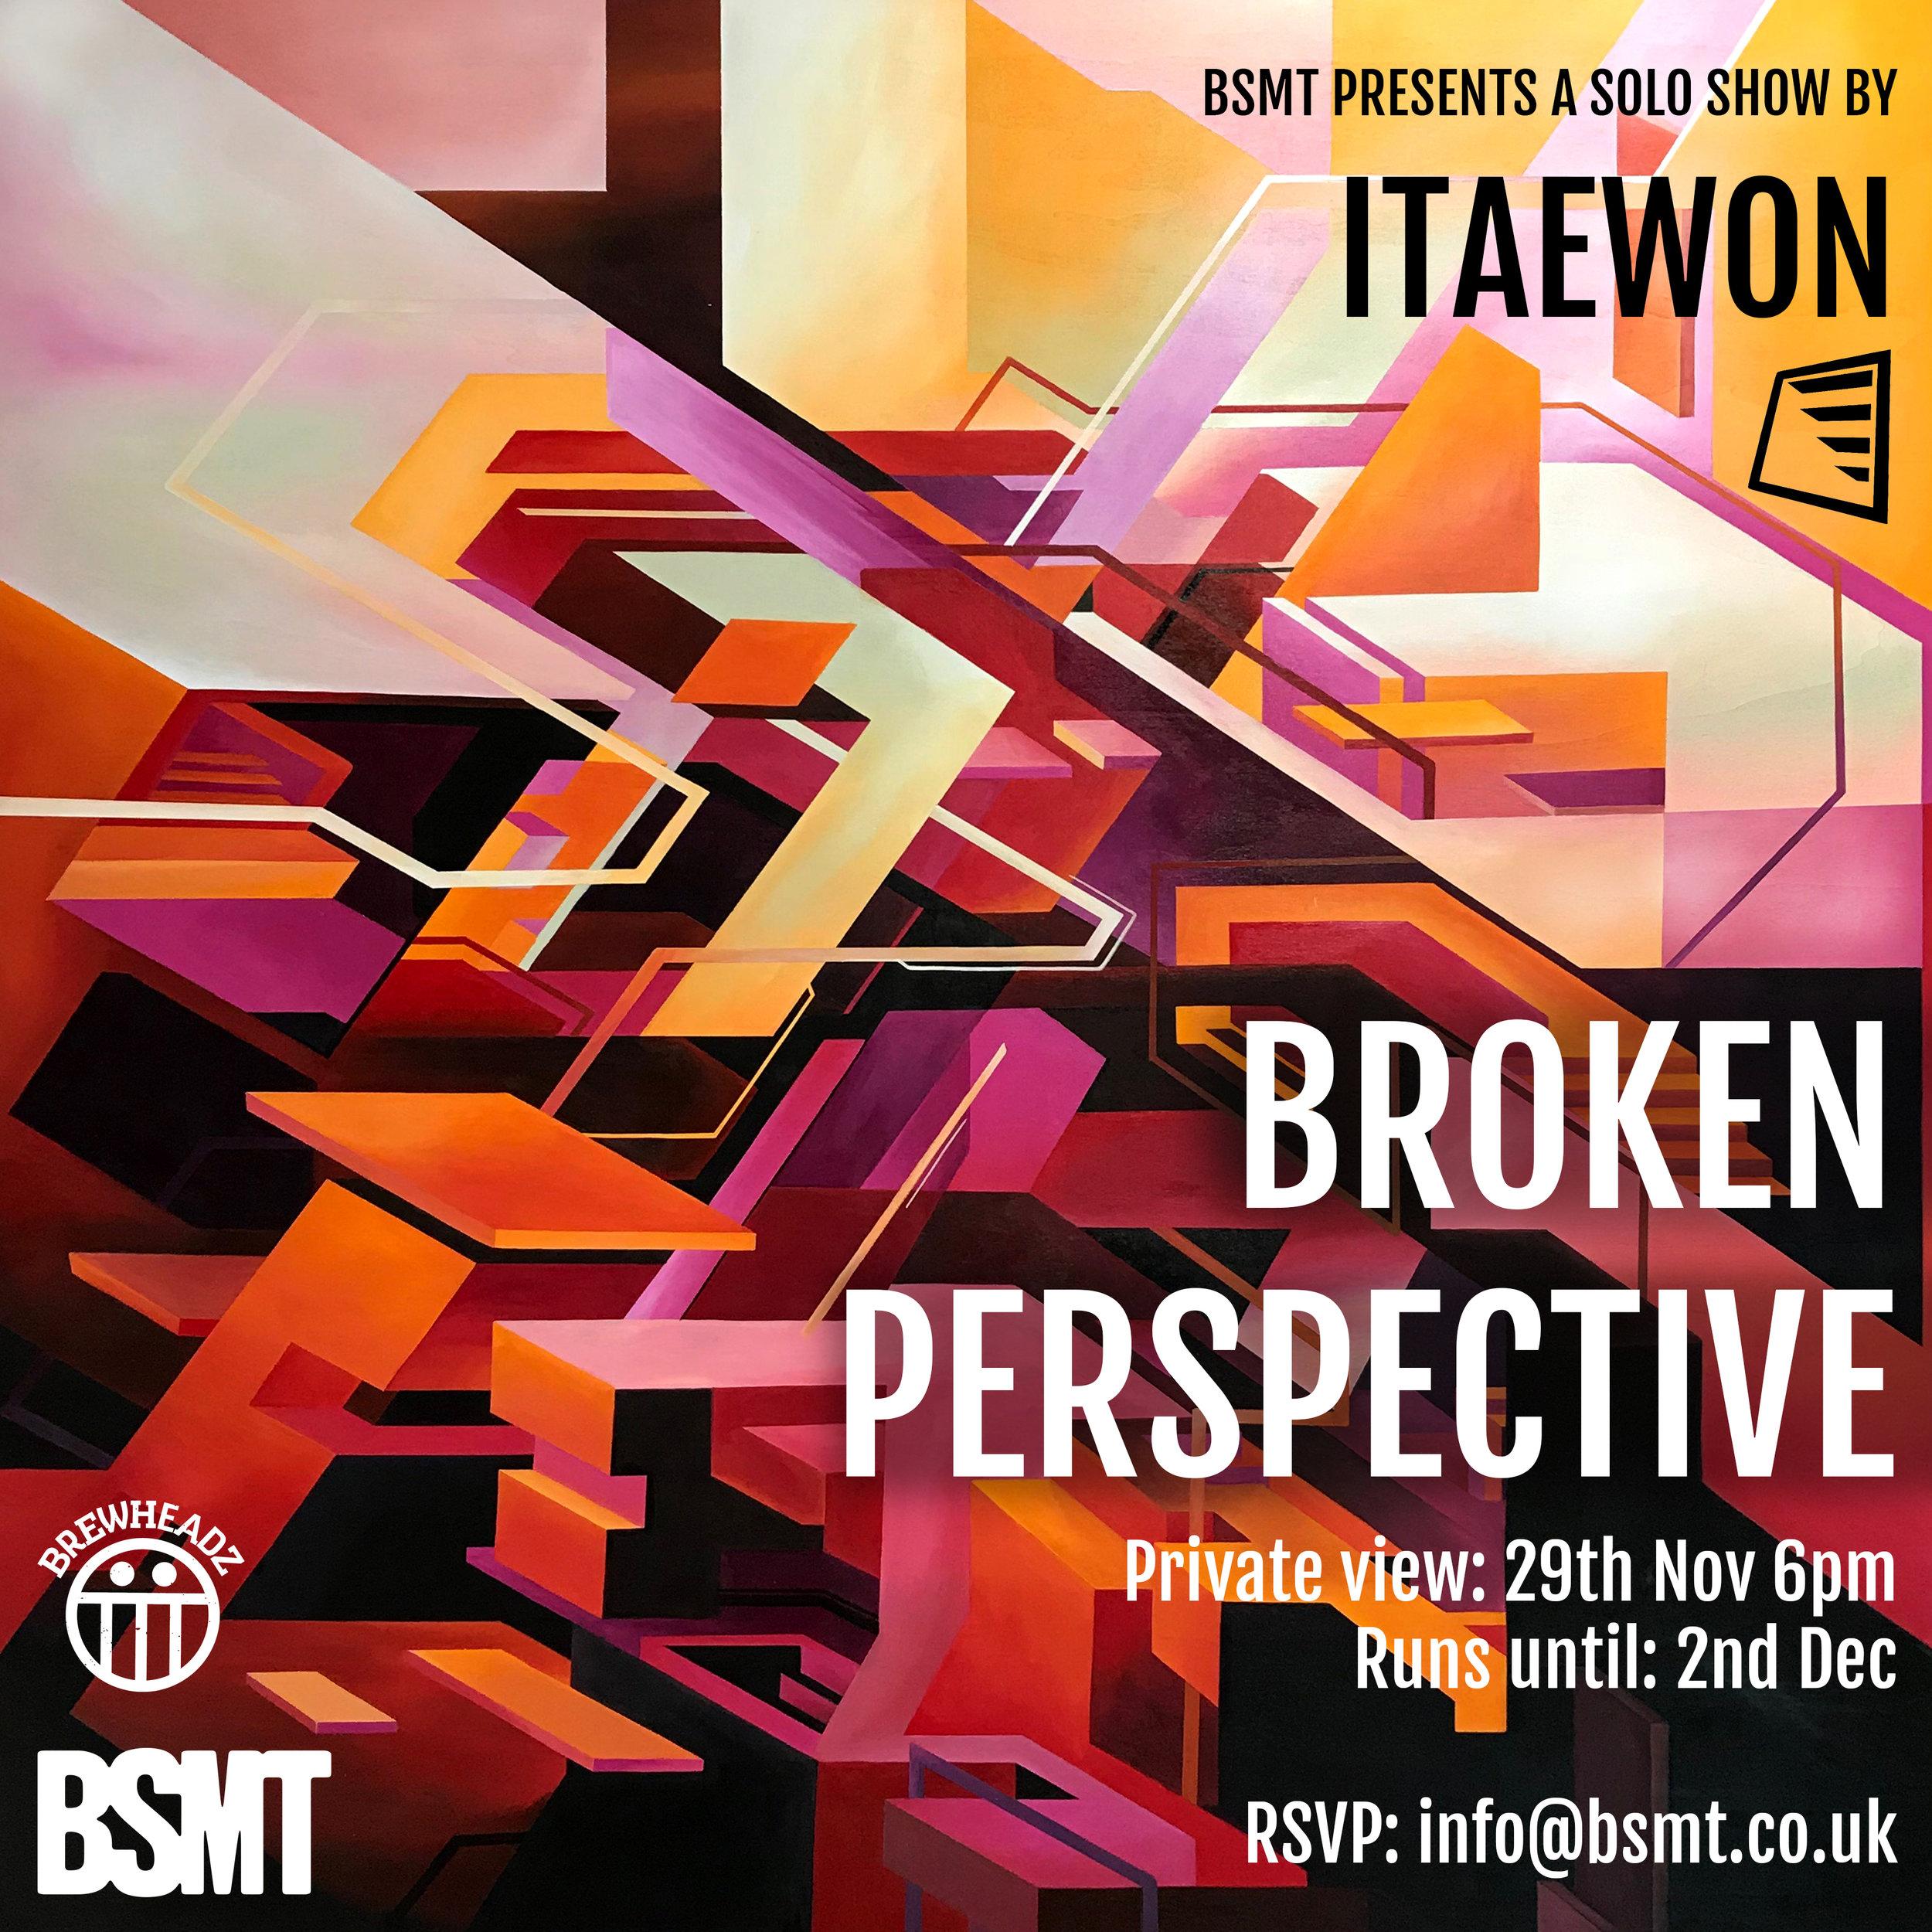 brewheadz sponsor Itaewon flyer.jpg